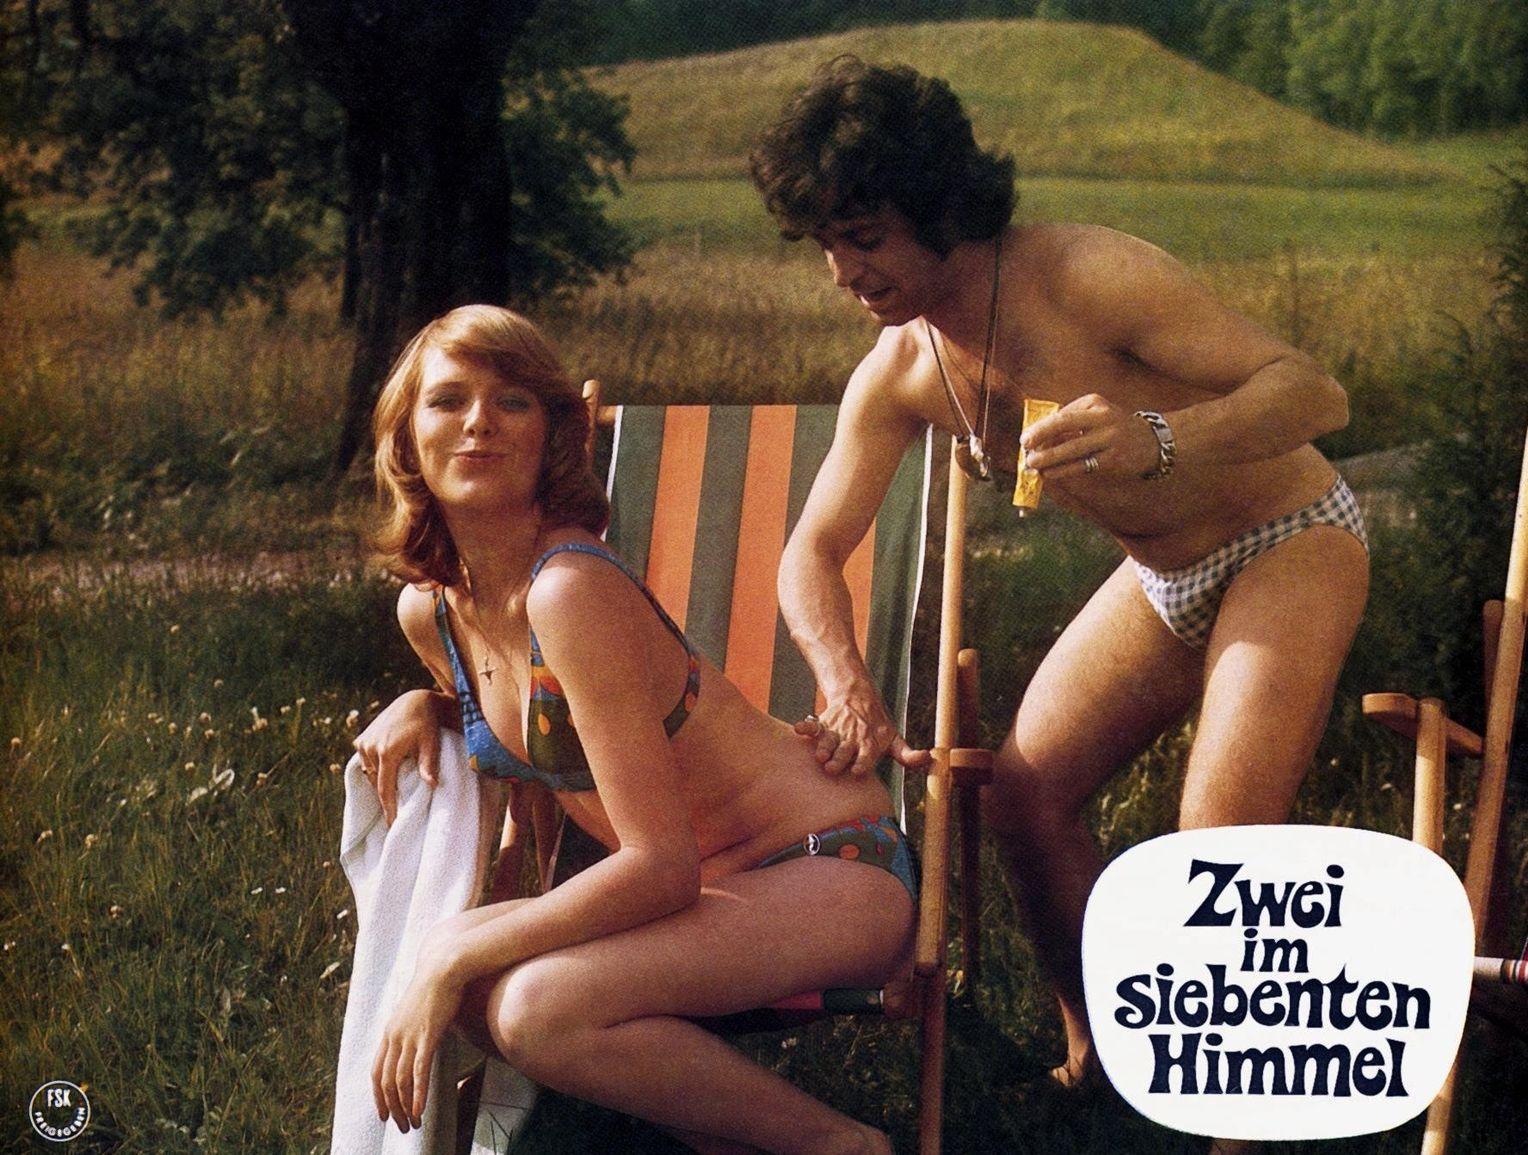 Franz hartwig nackt